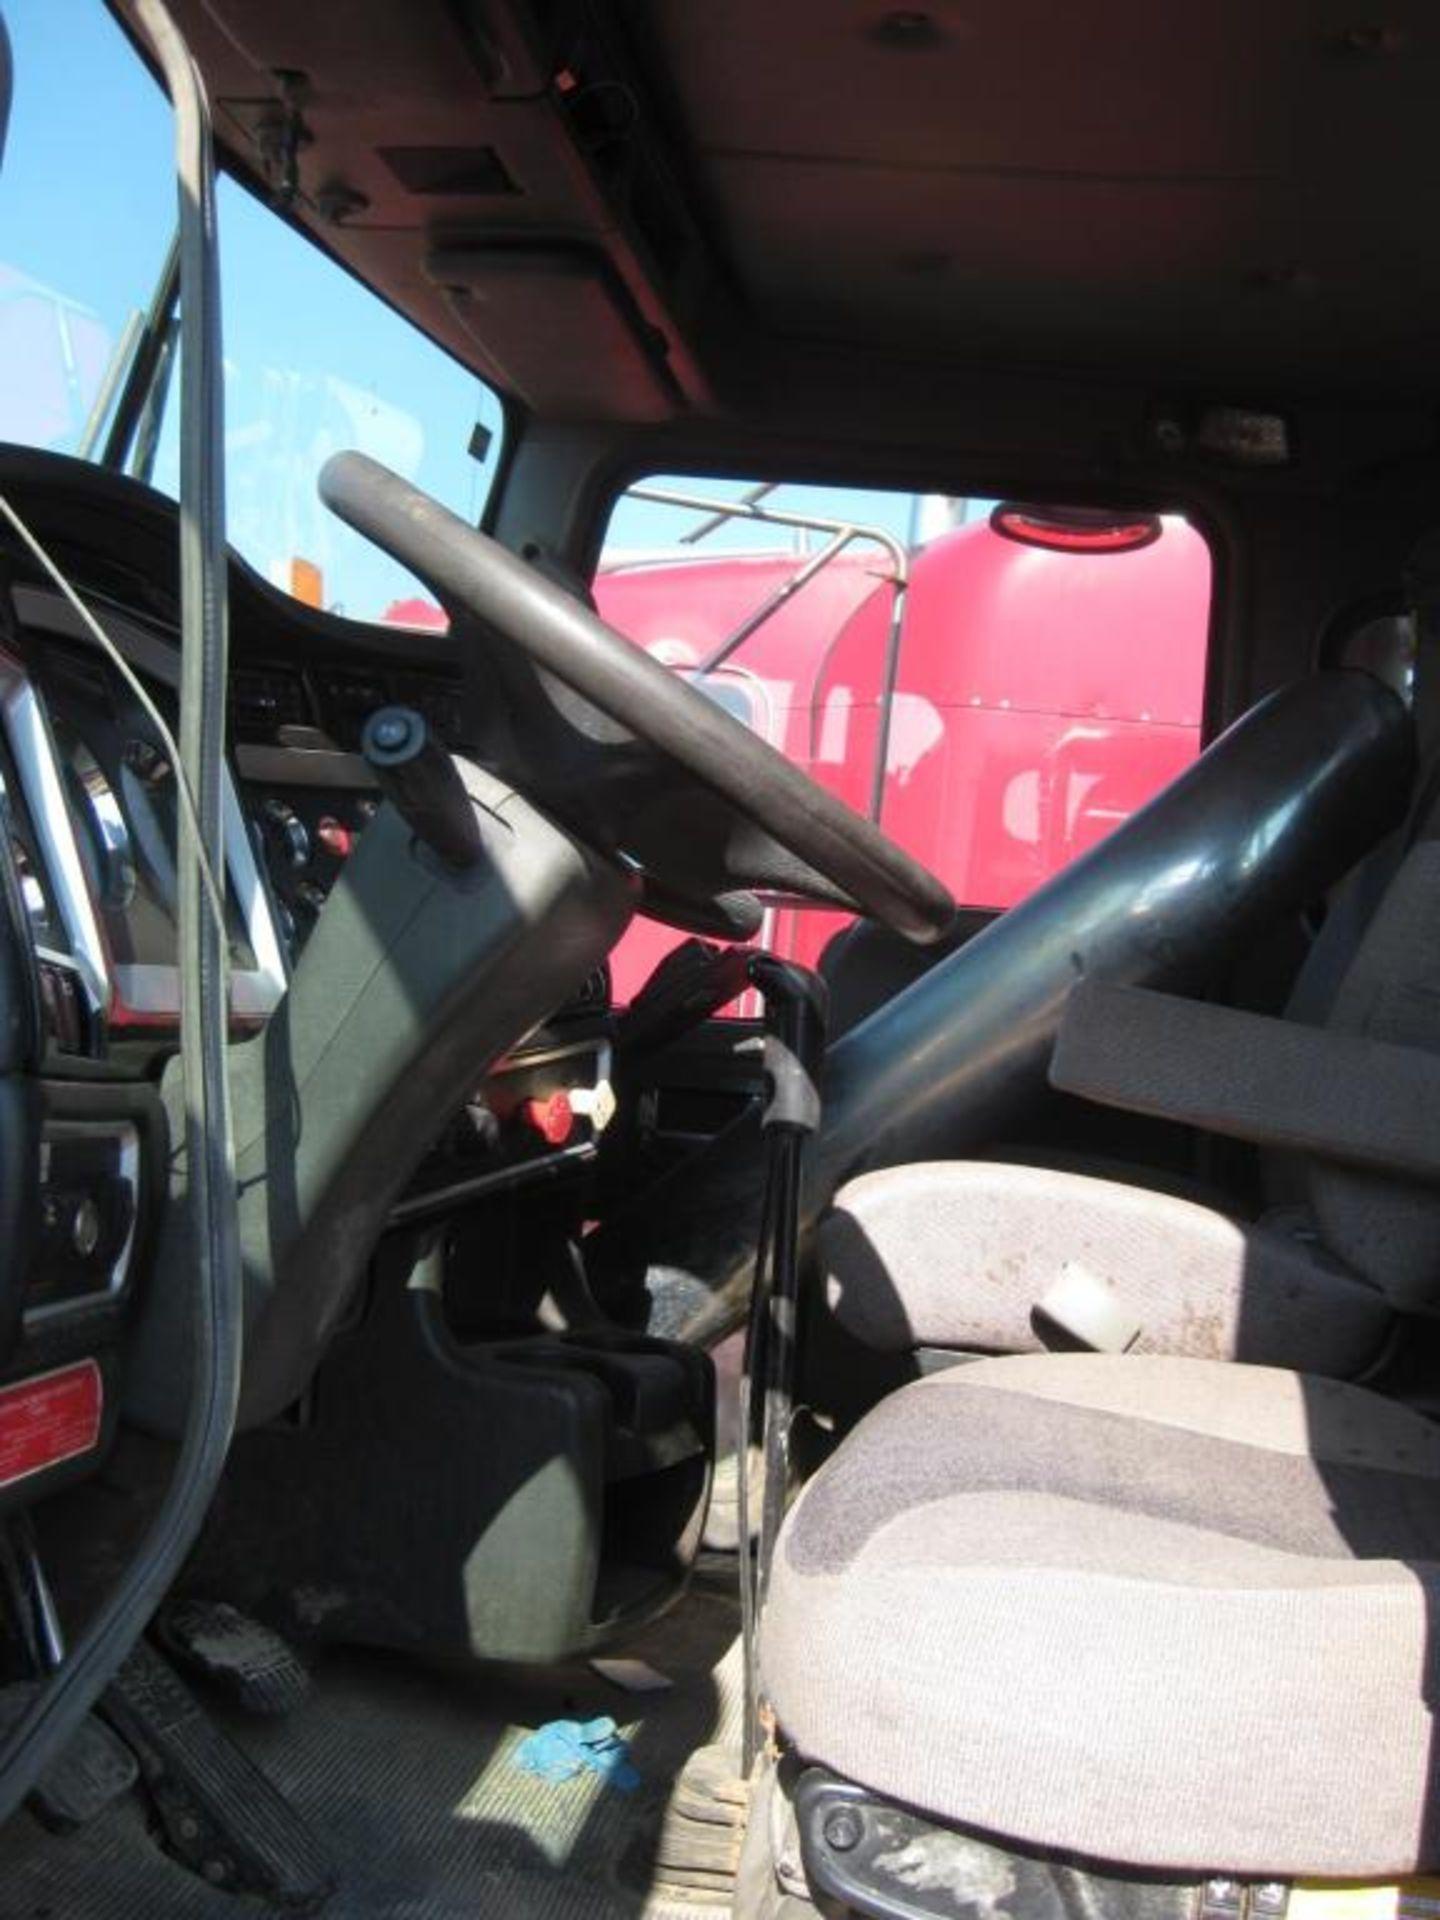 Kenworth Winch Truck - Image 15 of 27